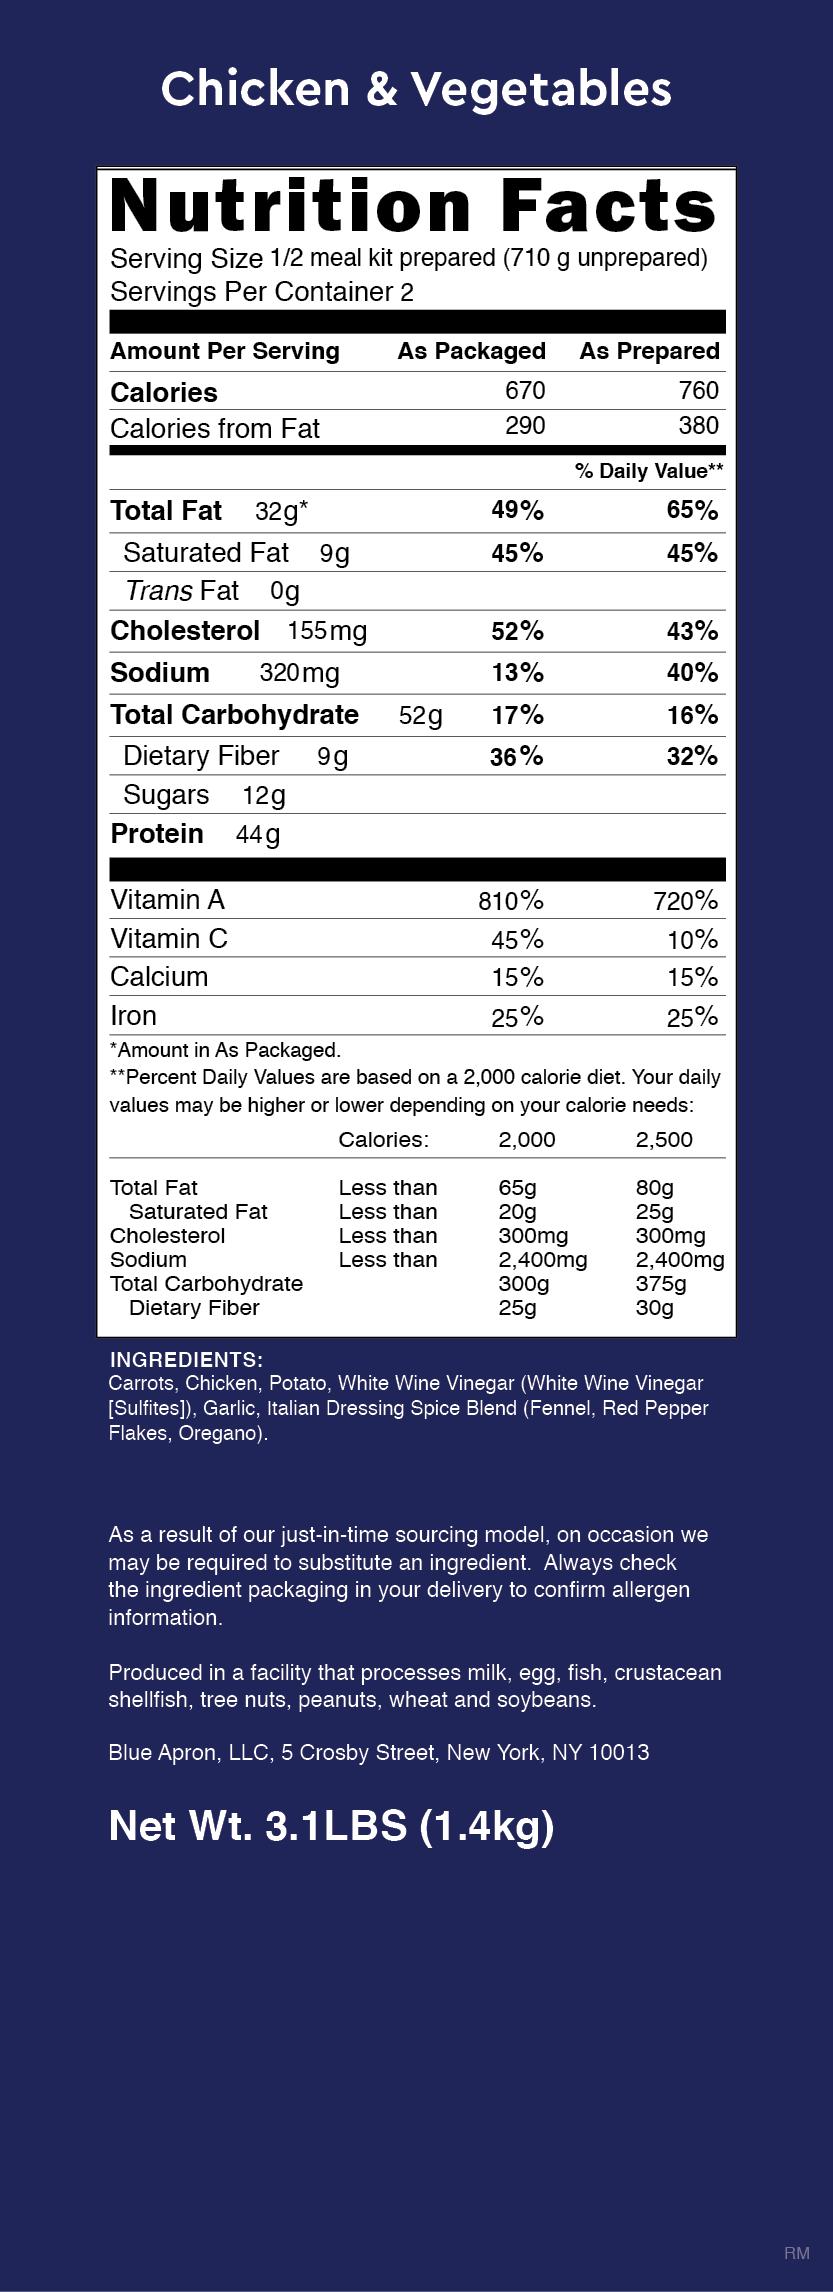 Blue apron is a ripoff - Nutrition Label